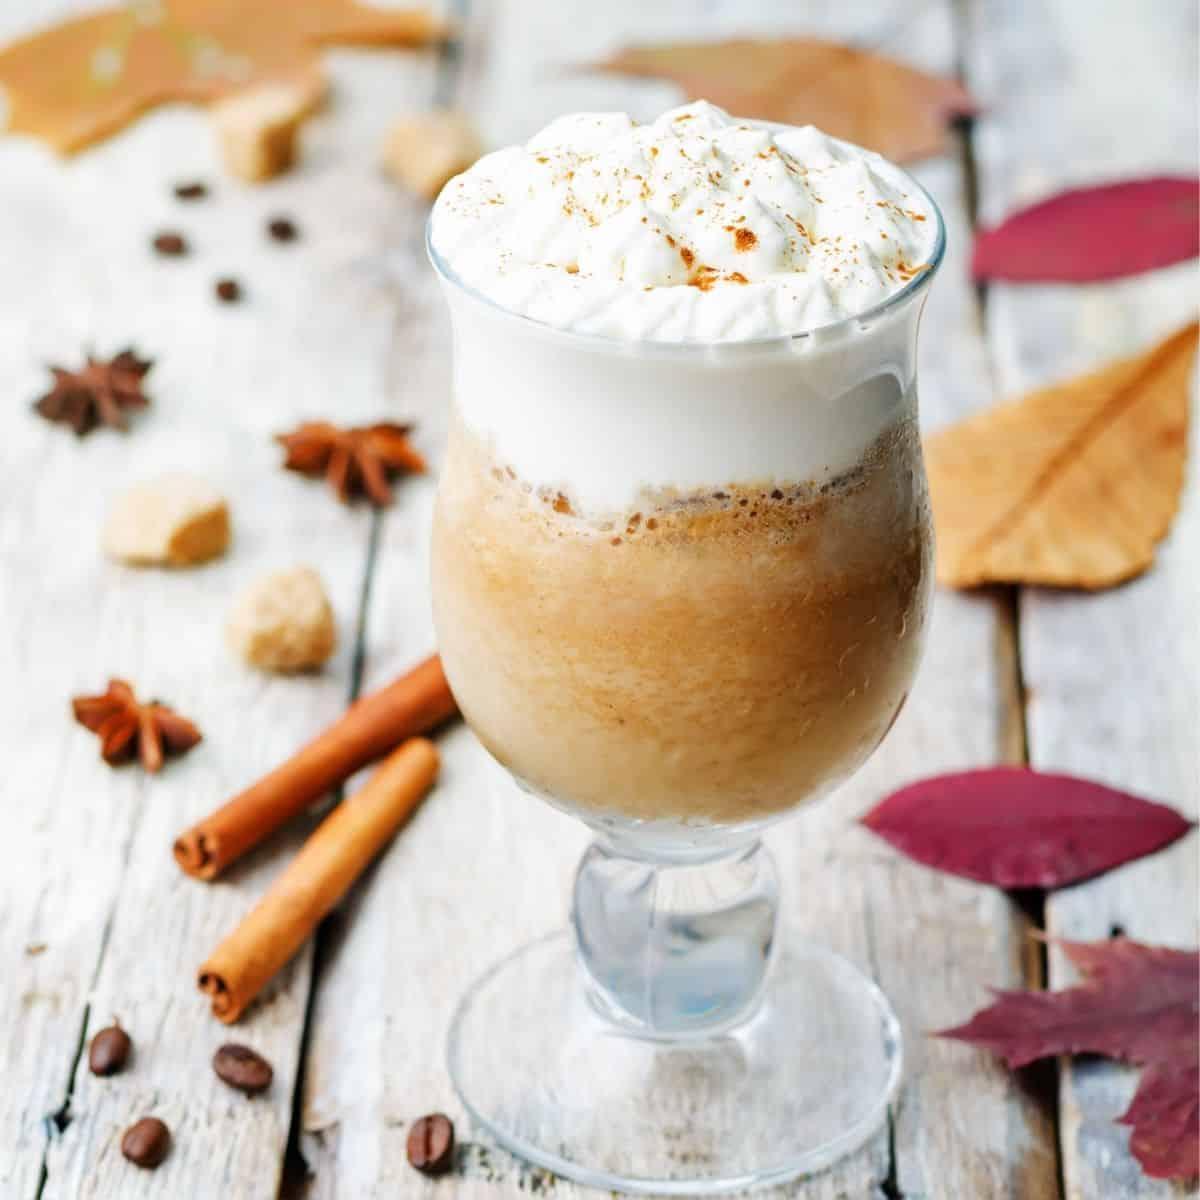 Keto Pumpkin Frappuccino FI